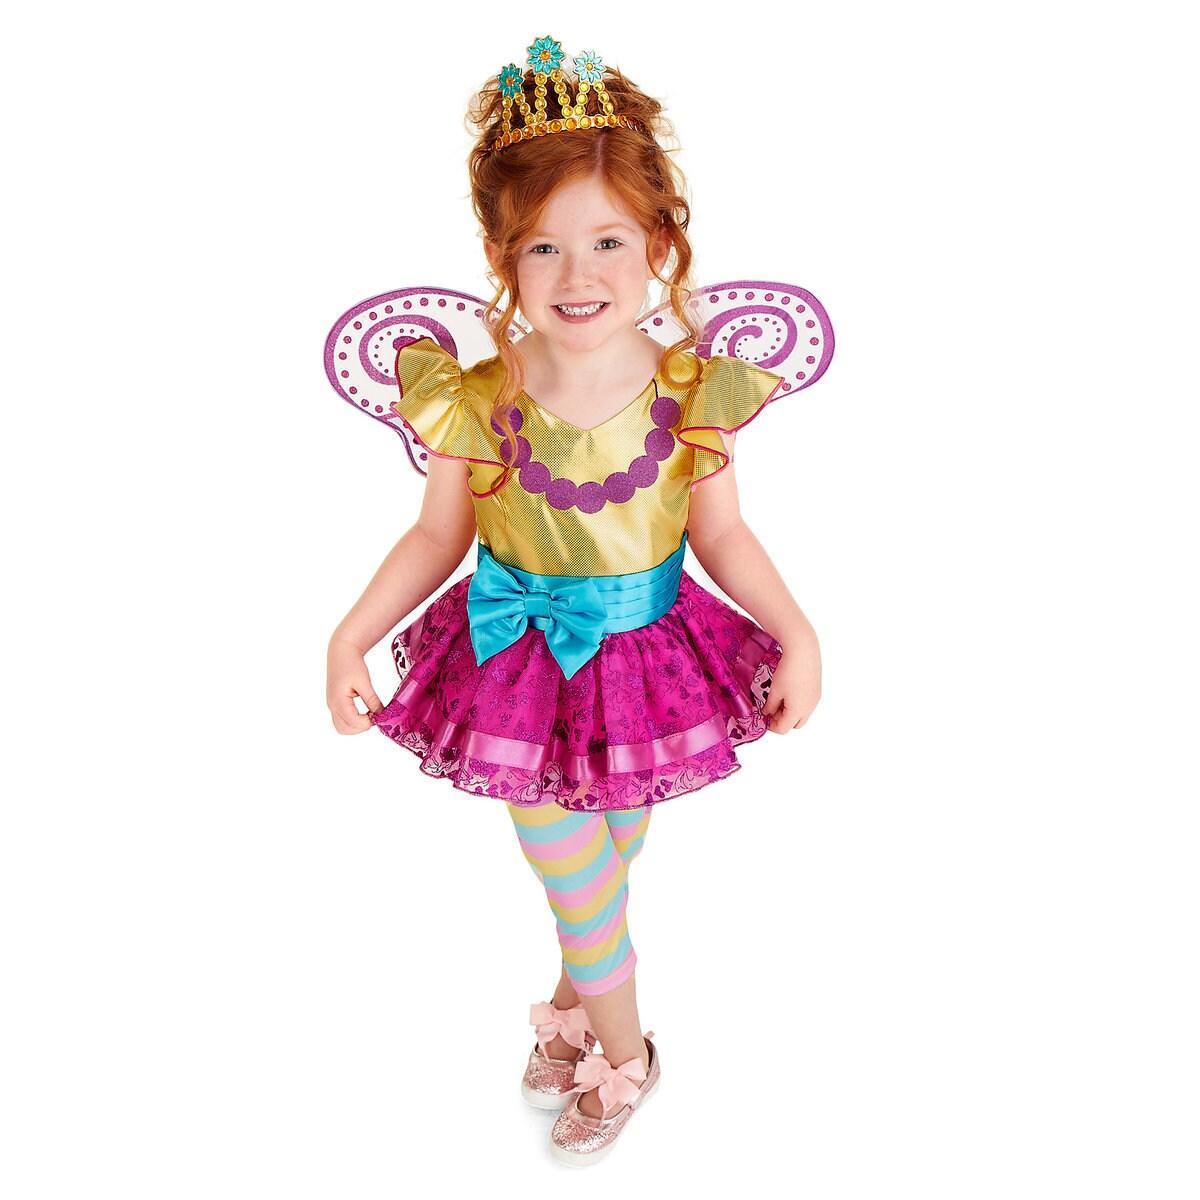 6f296b229eb4f Product Image of Fancy Nancy Costume Set for Kids # 1